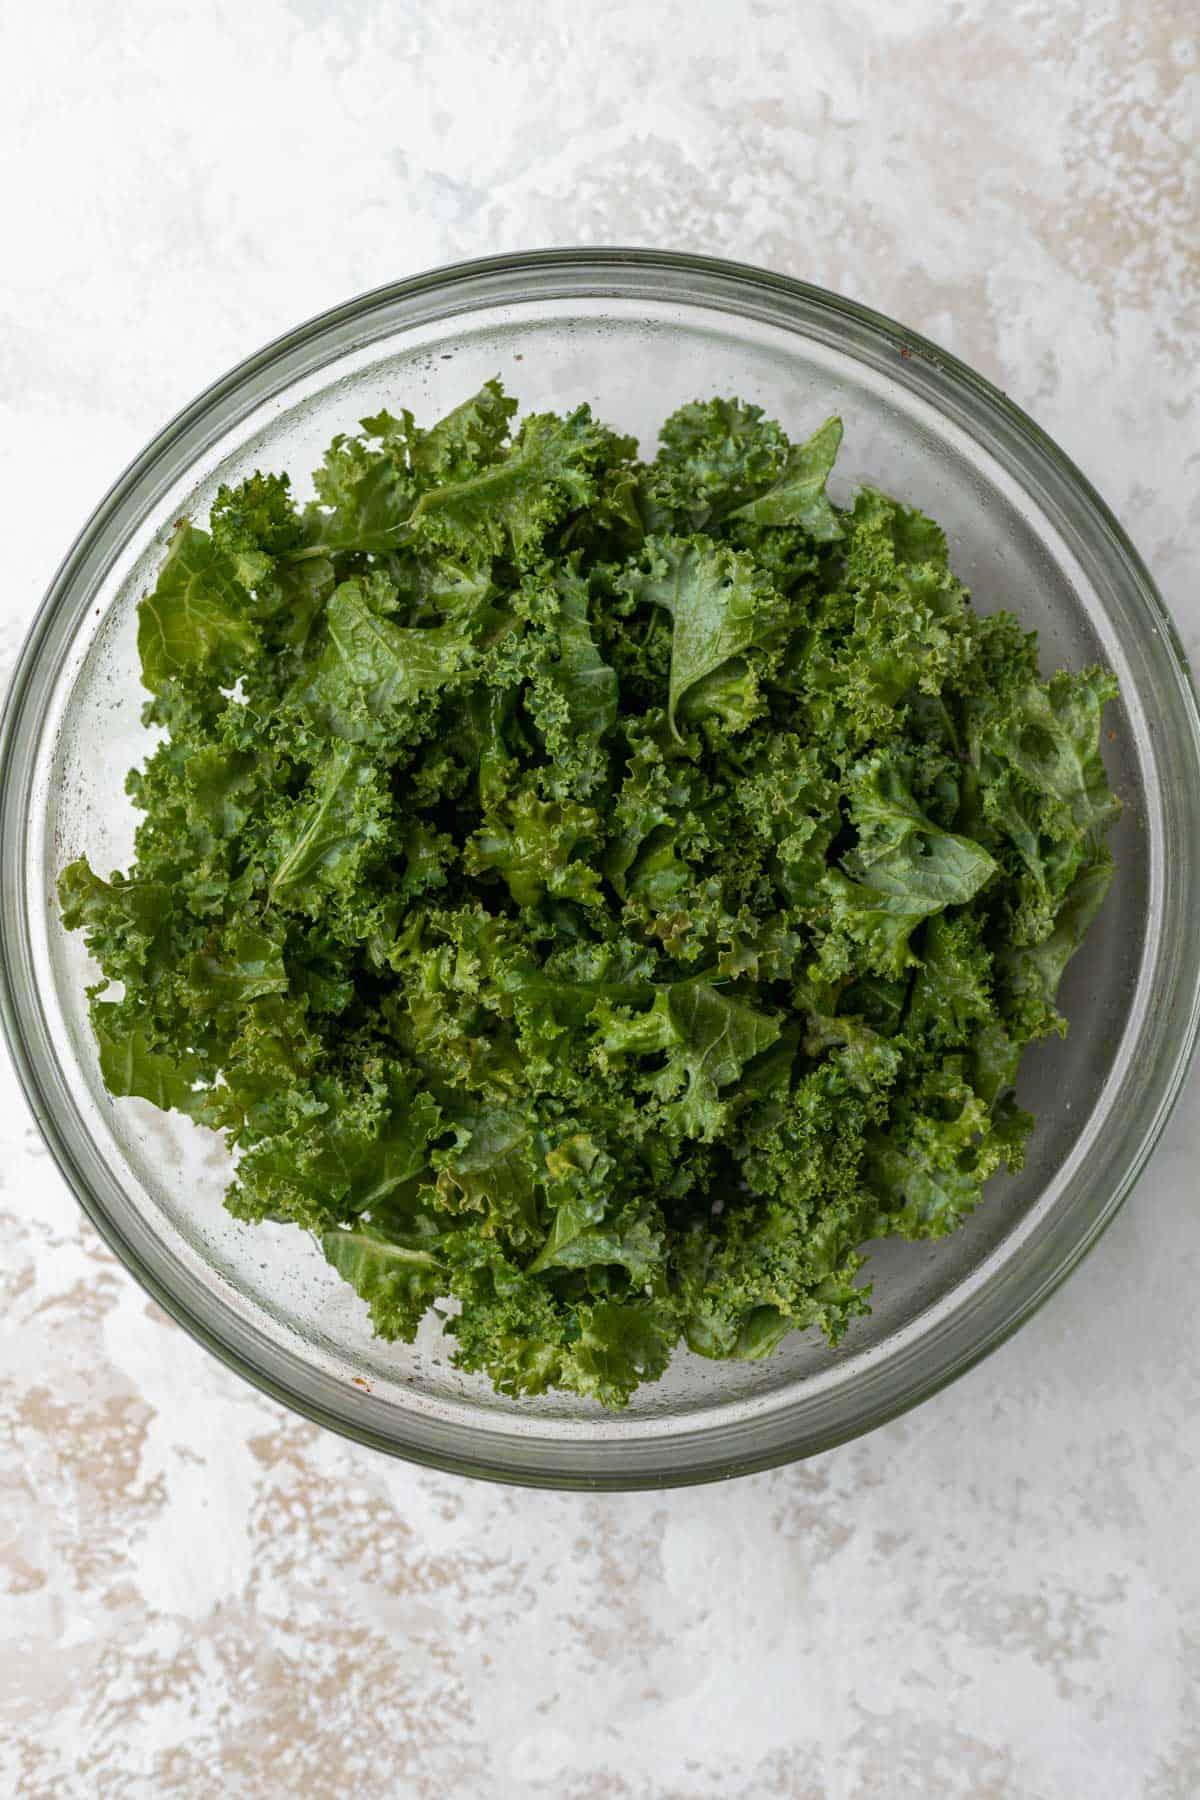 Chopped kale in a glass bowl.